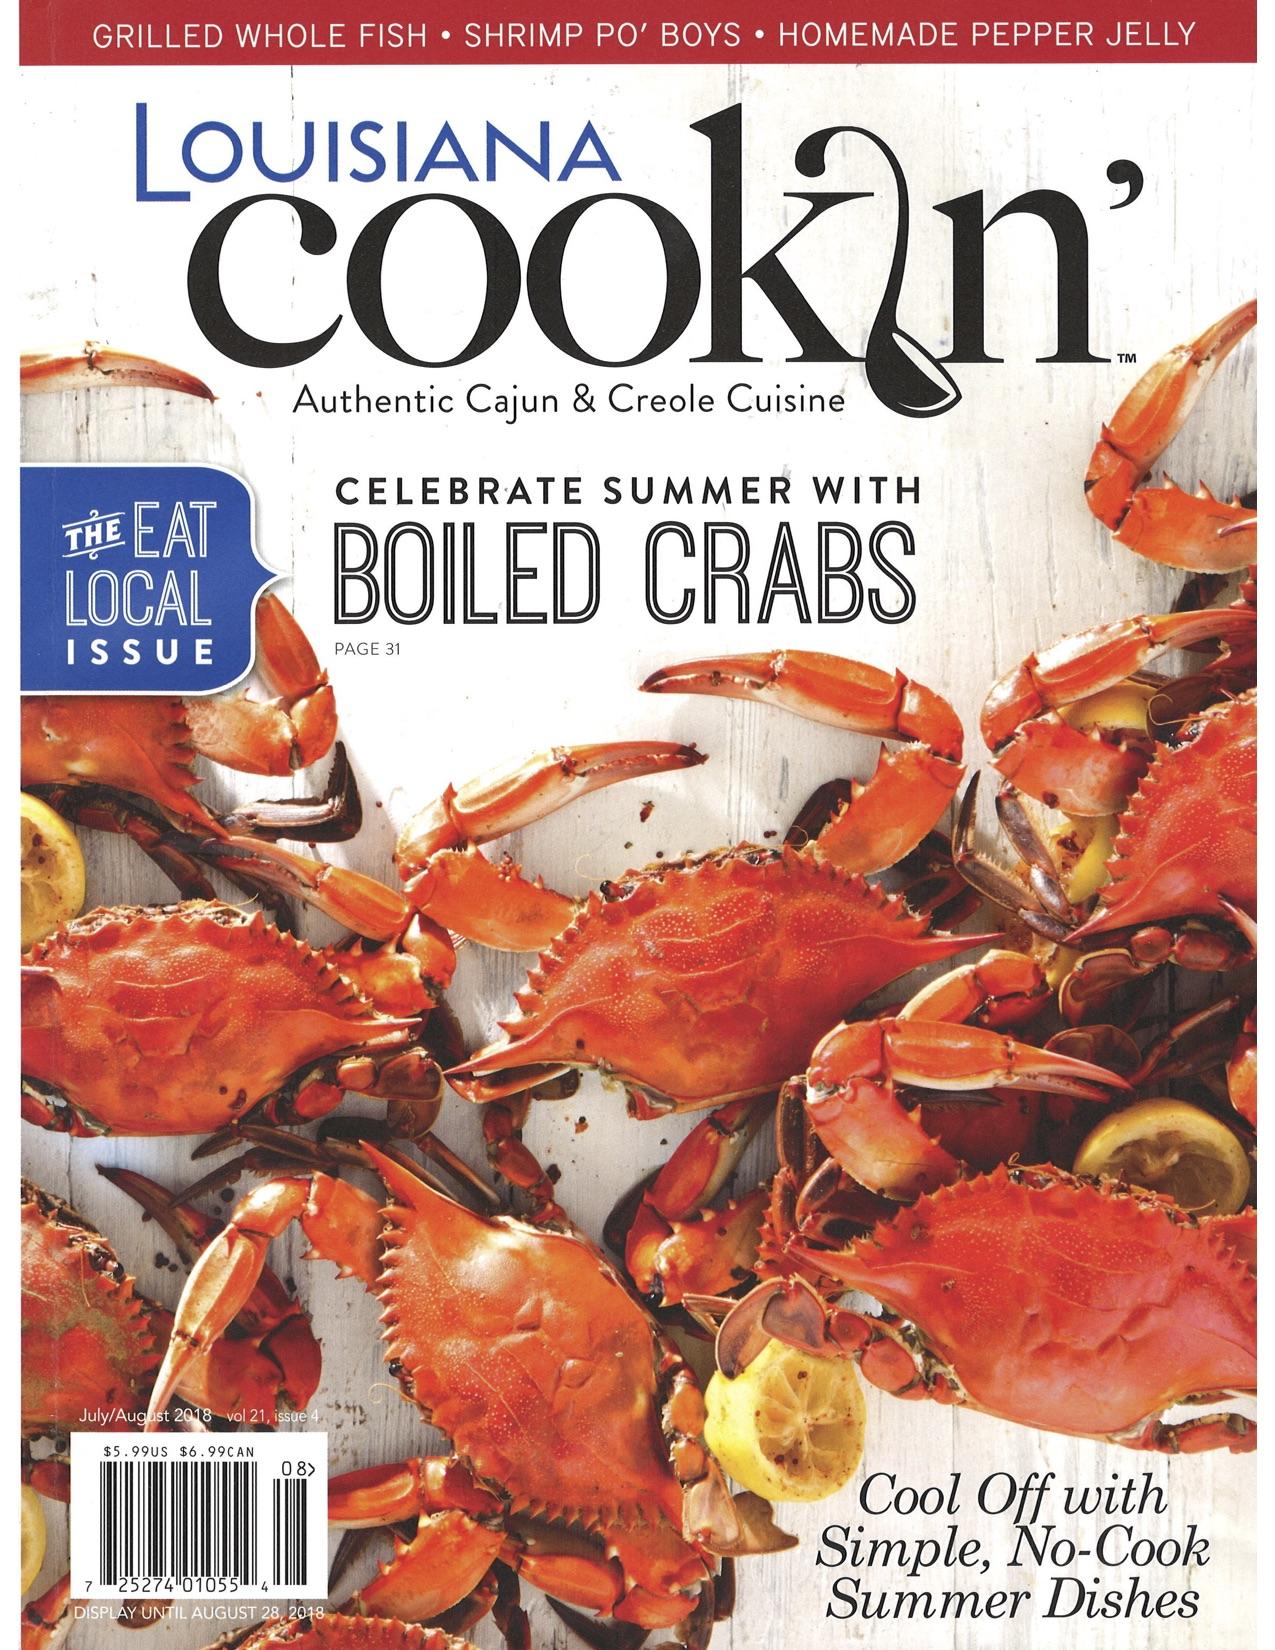 Louisiana Cookin_Chris Montero_Napoleon House_201807.jpg